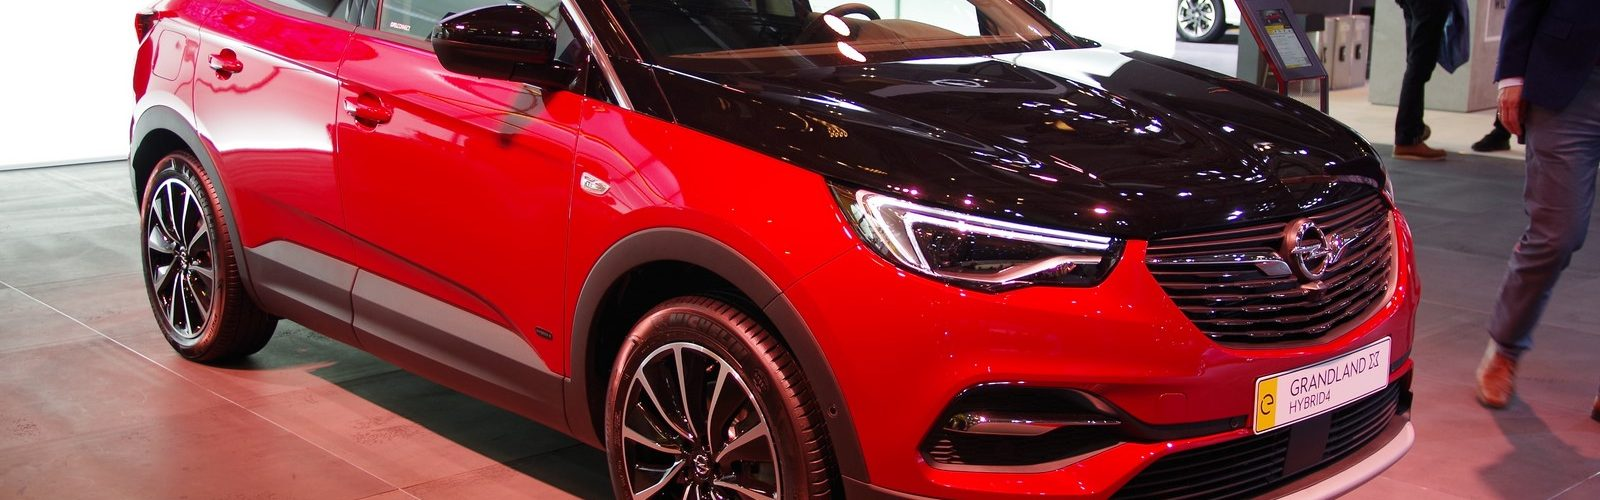 Opel Grandland X Hybrid 4 Francfort 2019 LNA FM 7